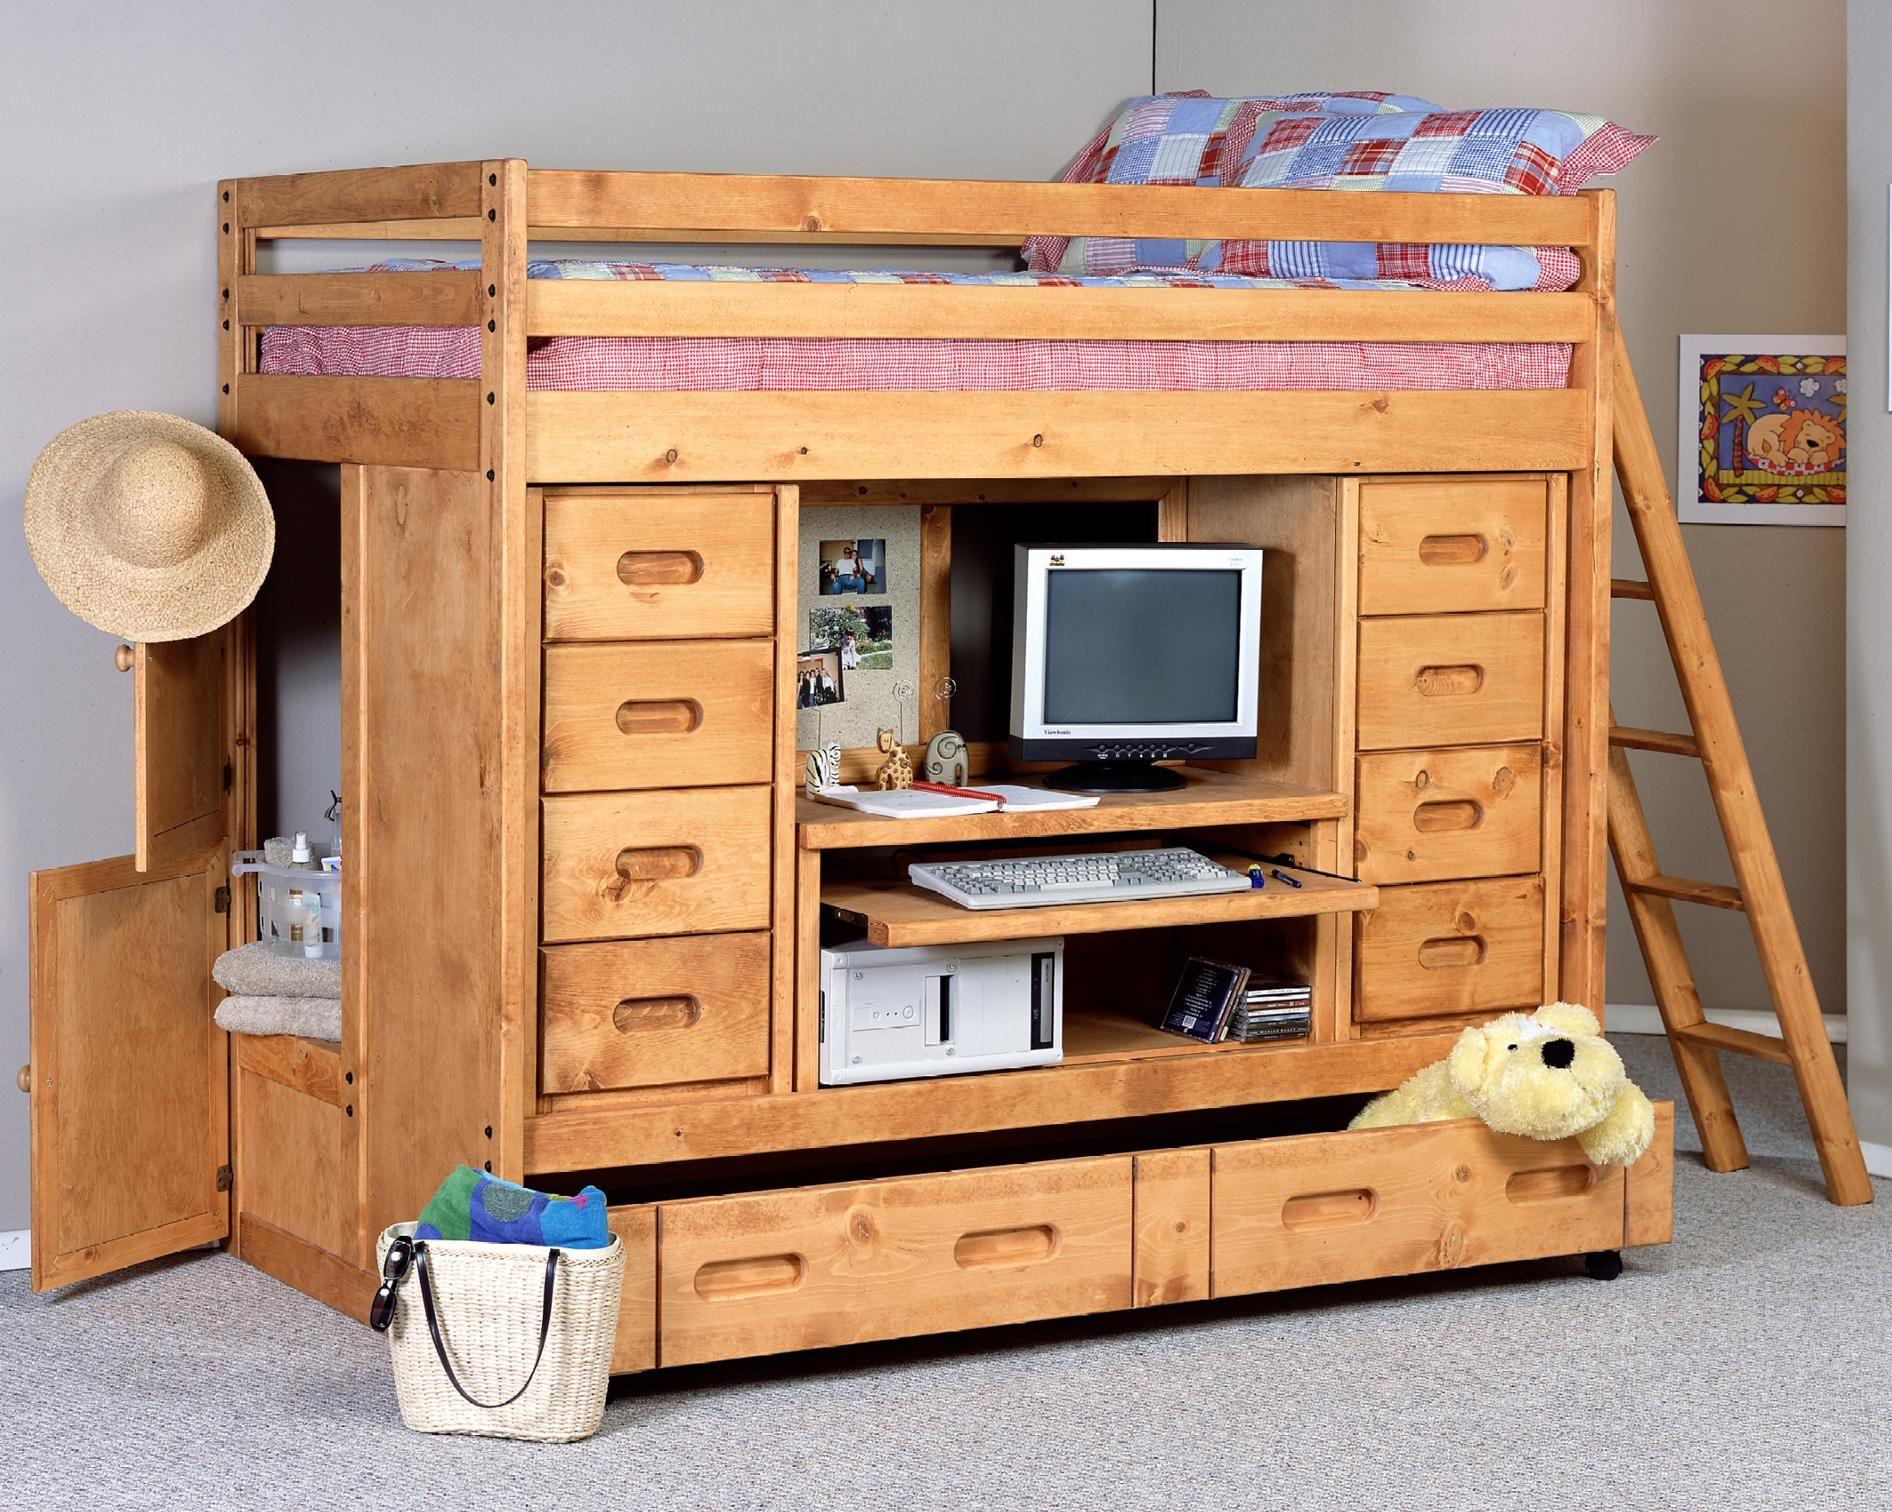 University loft graduate series twin xl open loft bed natural finish - Bunkhouse Twin Rodeo Loft Bed By Trendwood